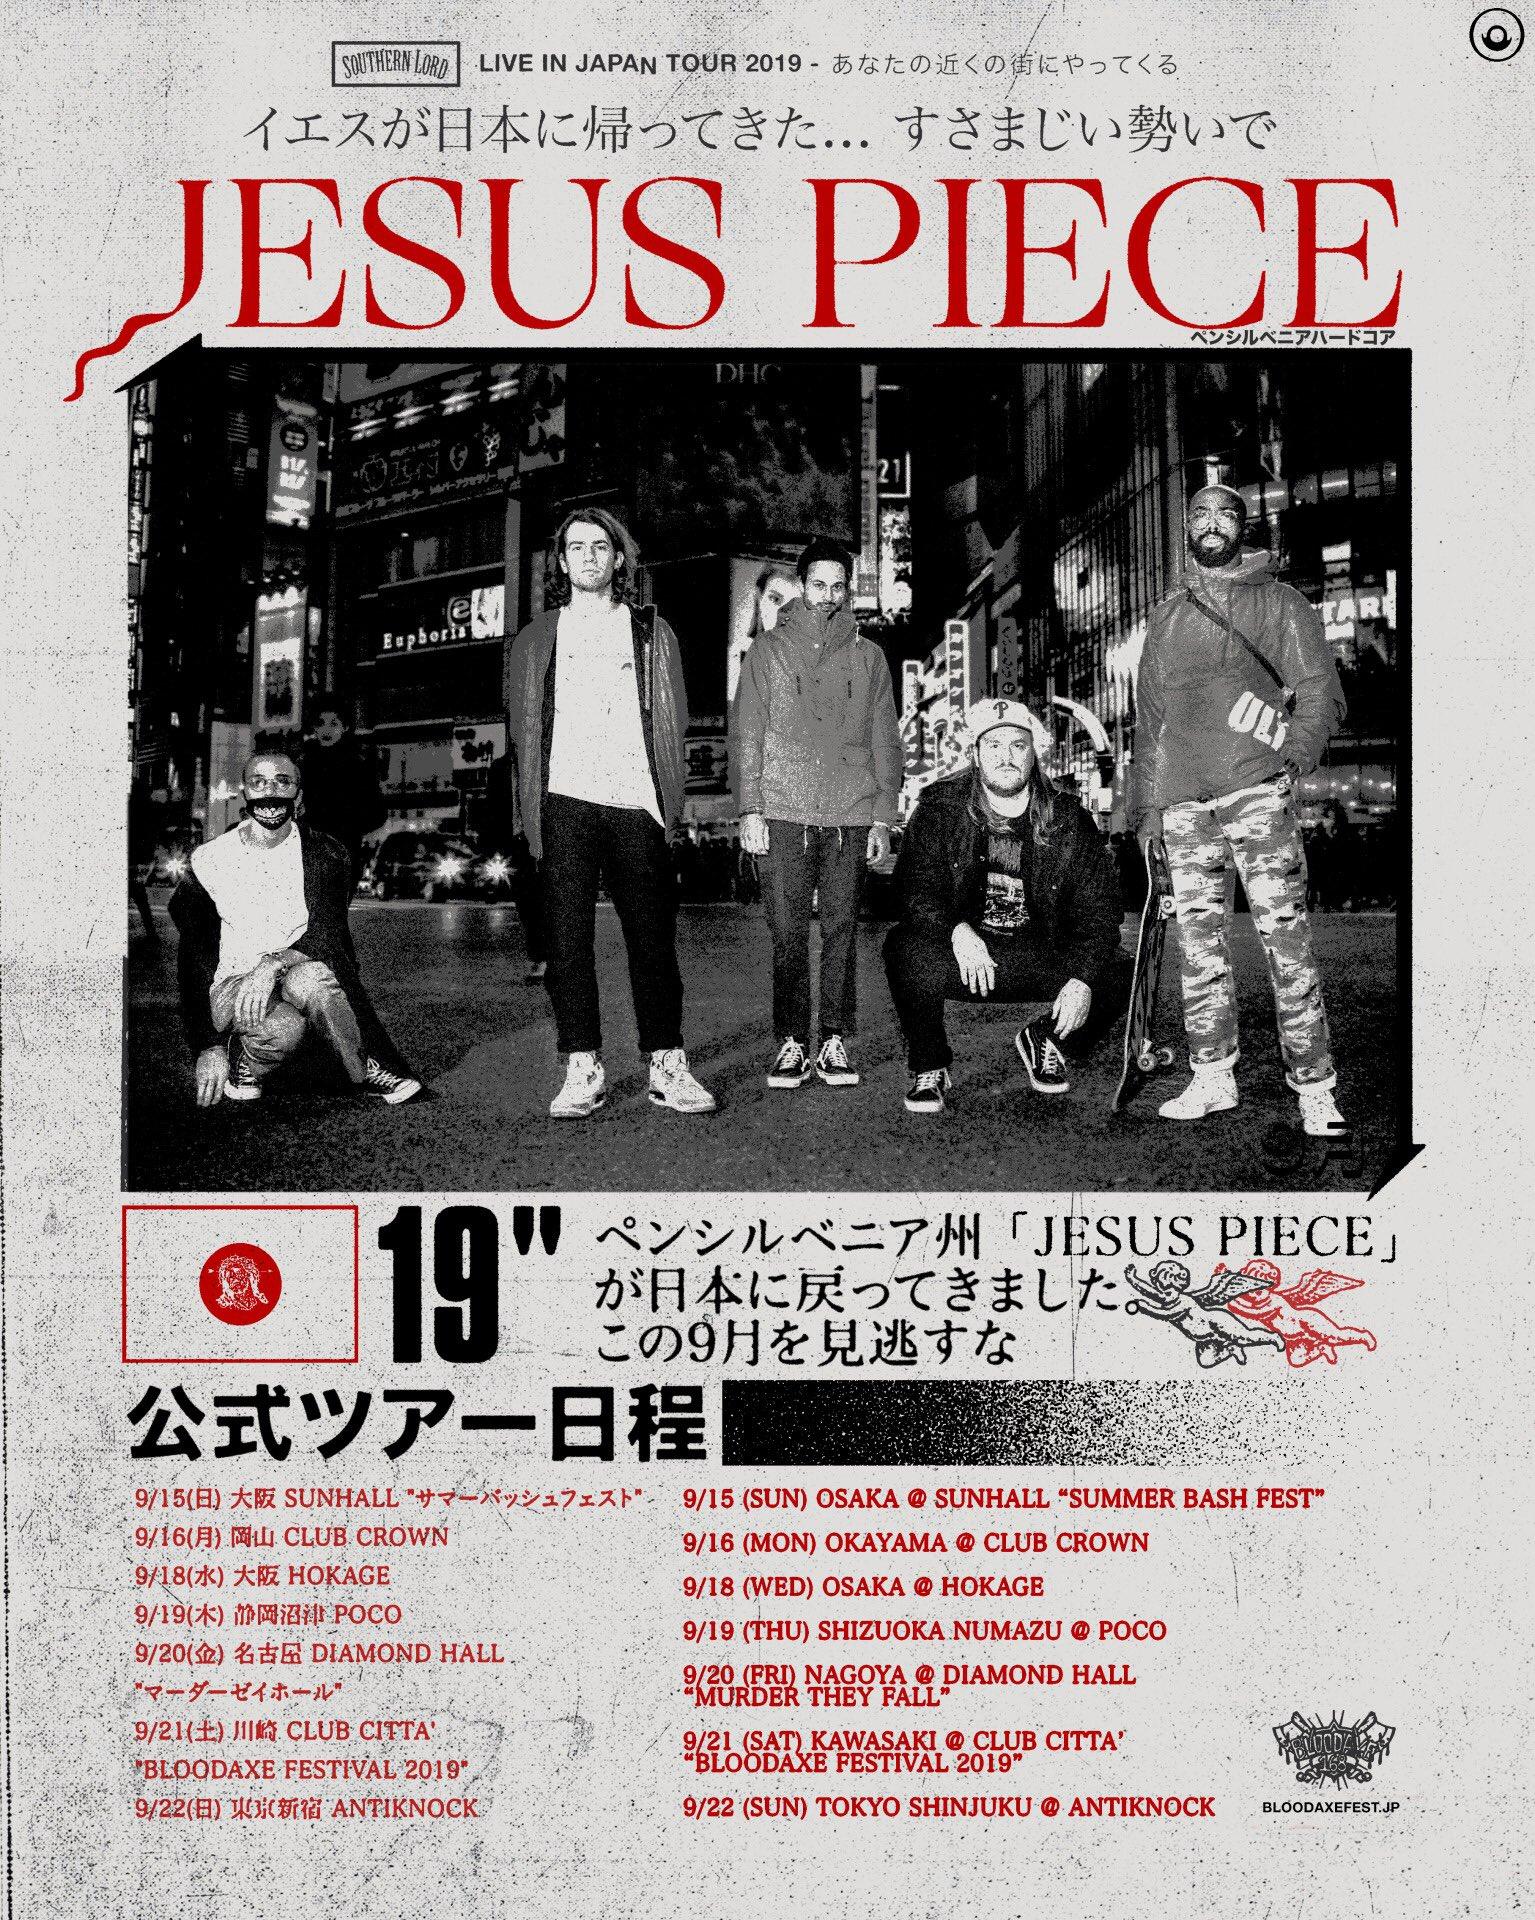 Jesus Piece / ジーザス・ピース